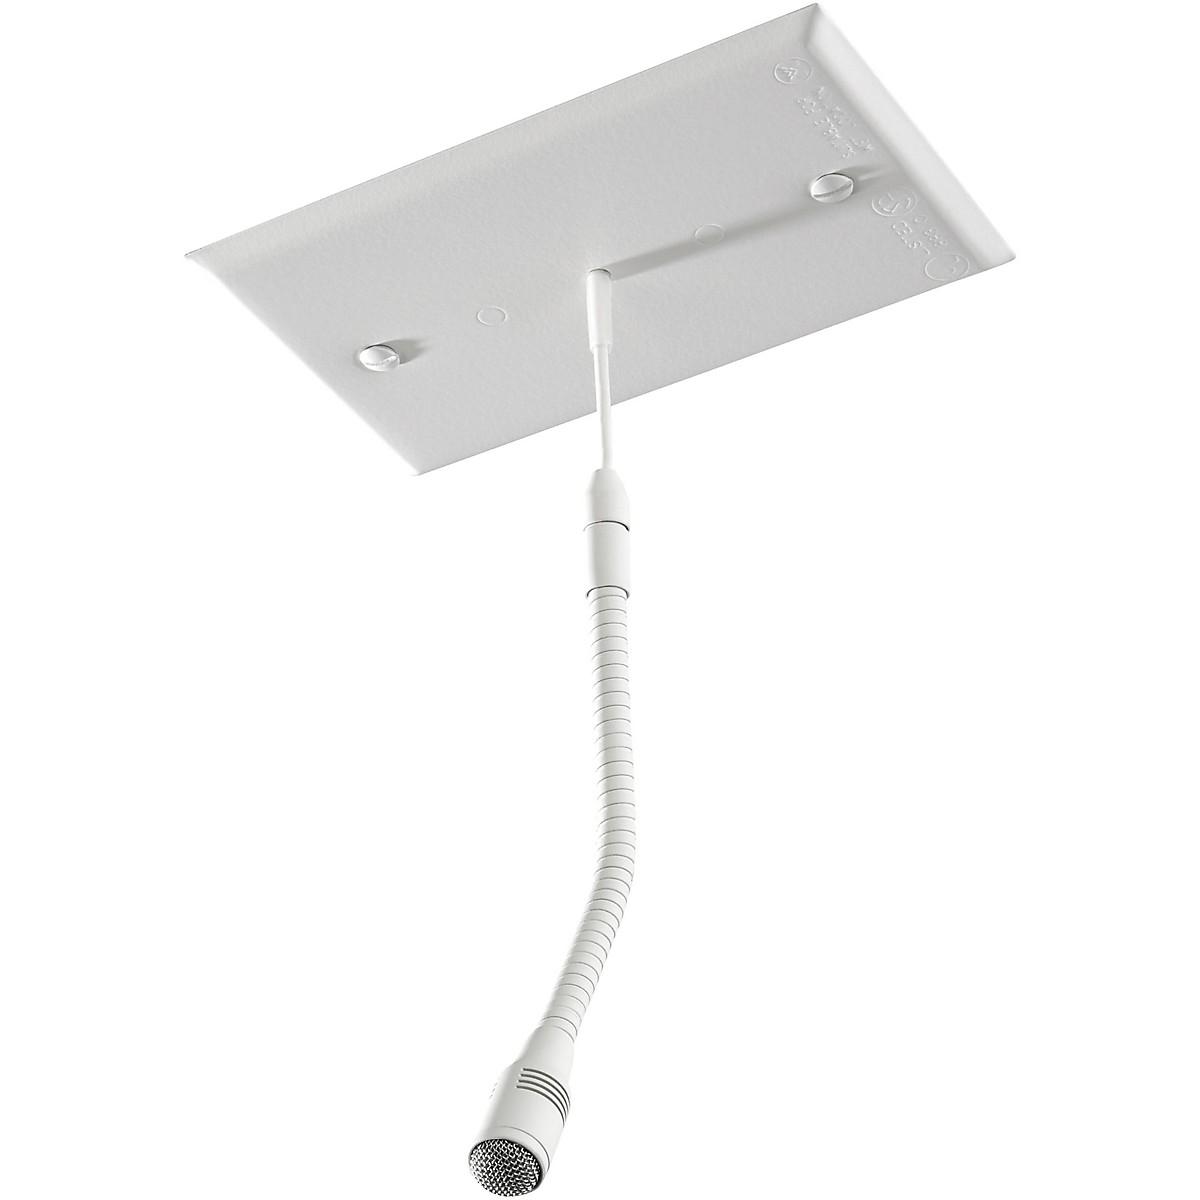 Beyerdynamic OM 304 US - Gooseneck Microphone in White